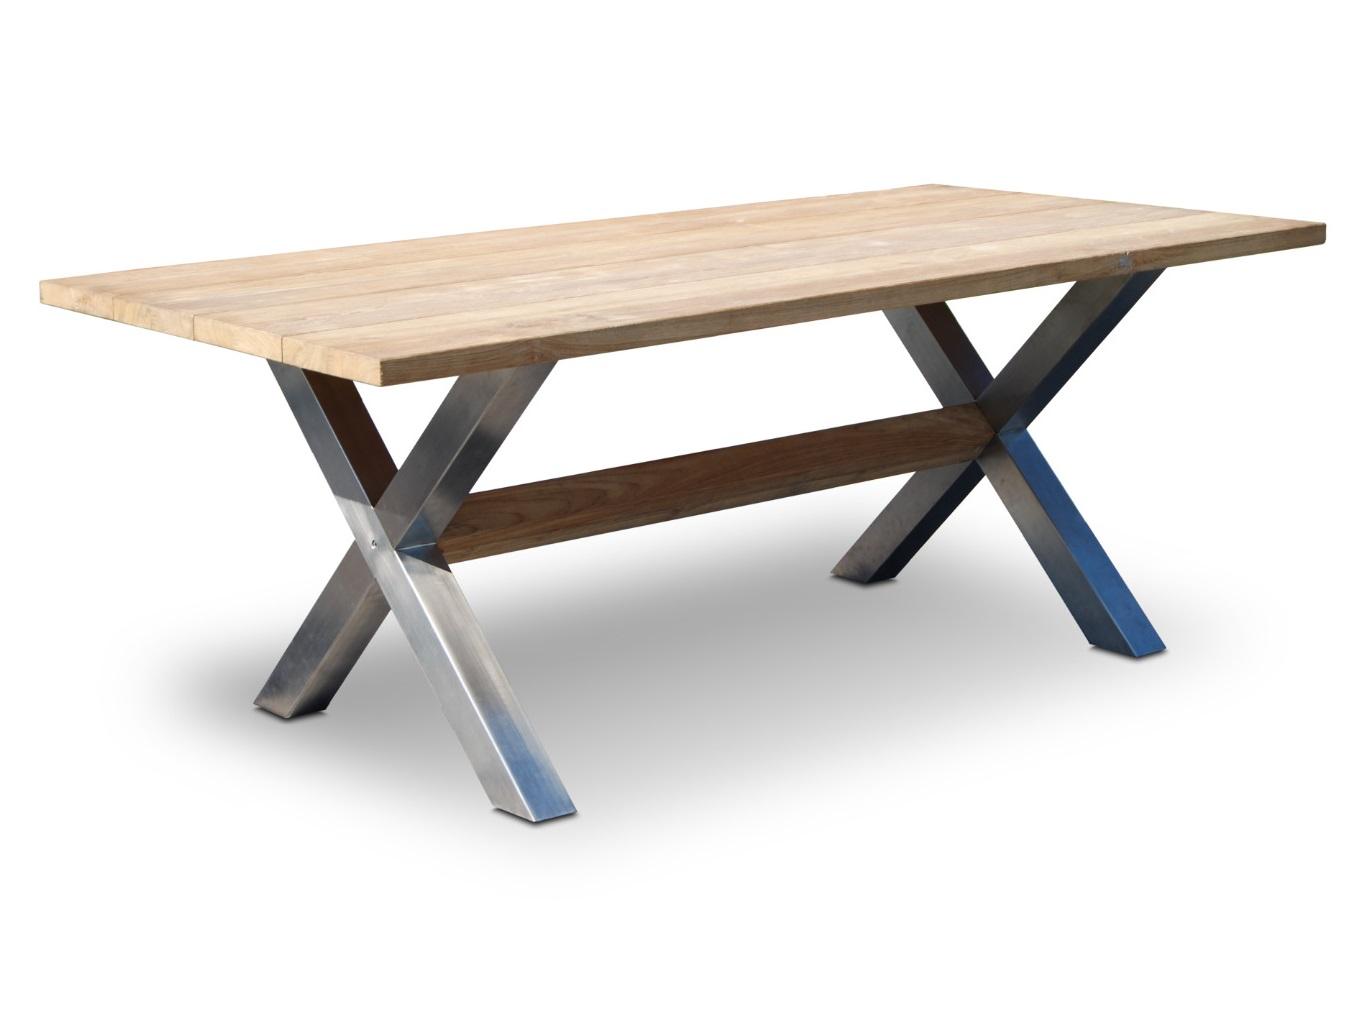 Стол NauticСтолы и столики для сада<br>Цвет столешницы: тик<br><br>Material: Дерево<br>Length см: 200<br>Width см: 100<br>Depth см: None<br>Height см: 75<br>Diameter см: None